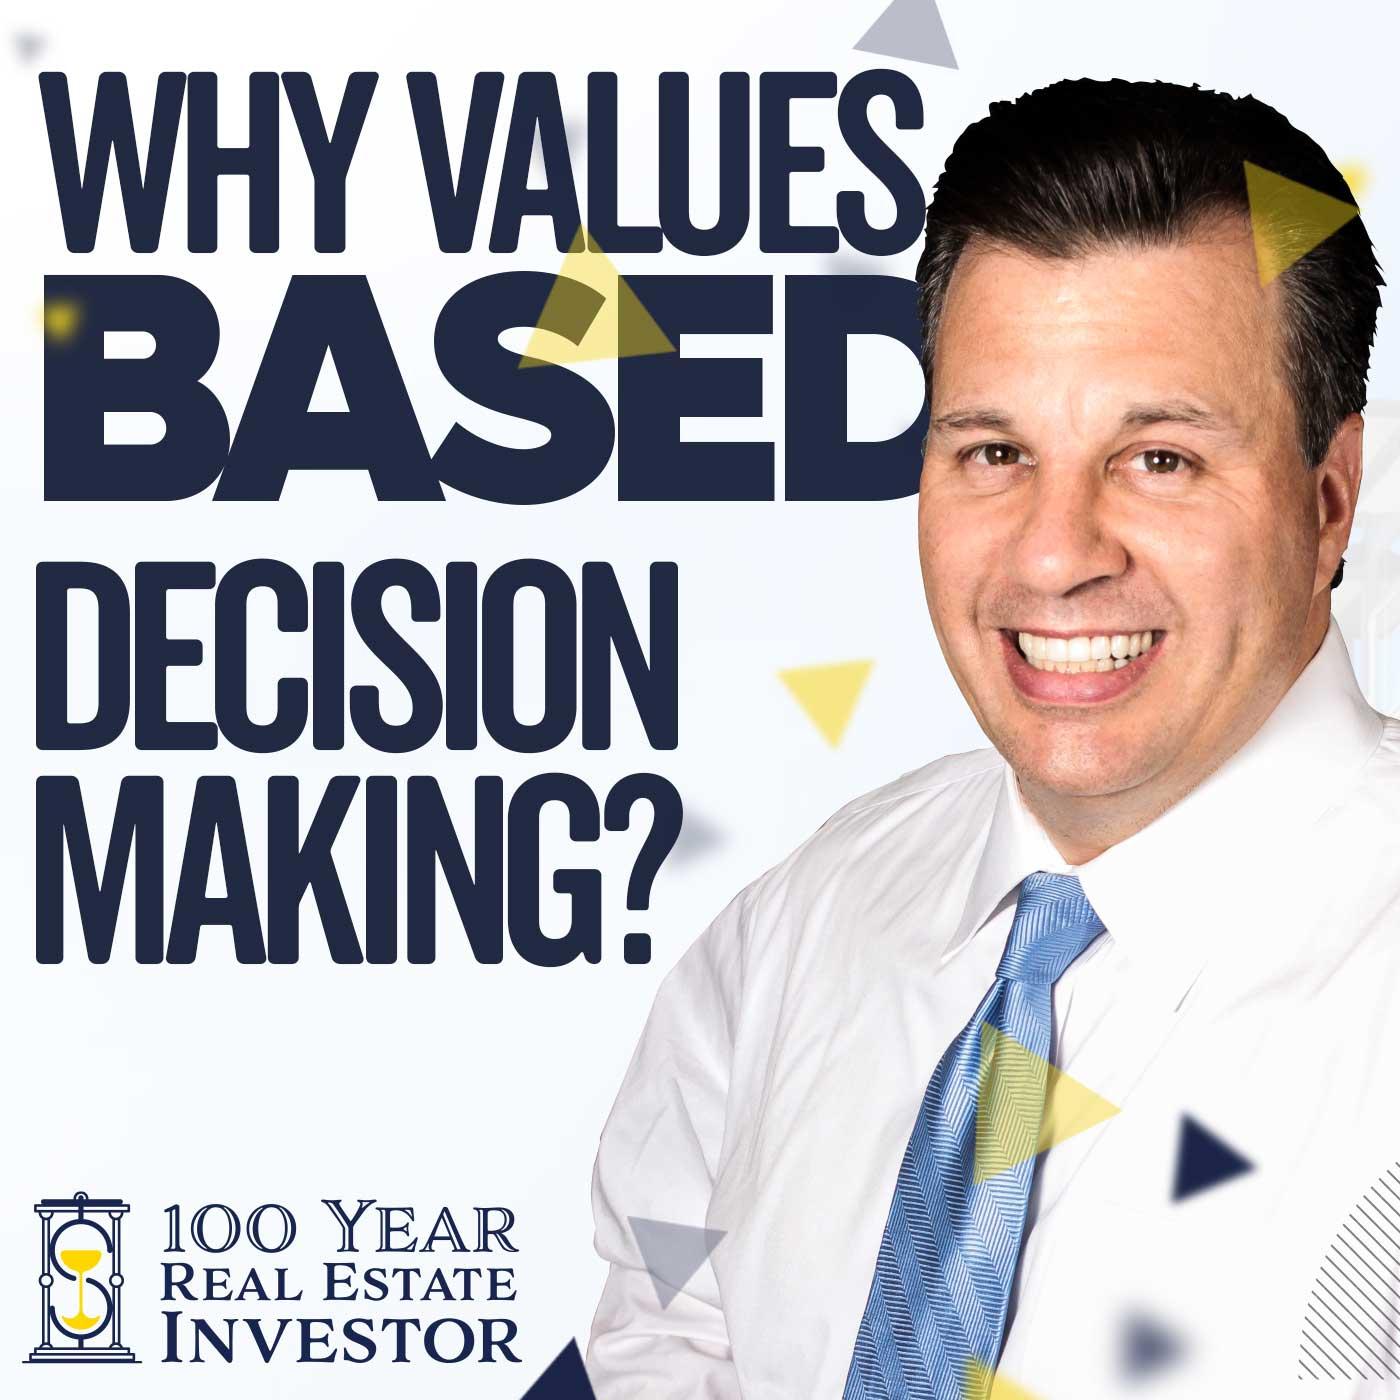 Rick Sapio & Value Based Decision Making